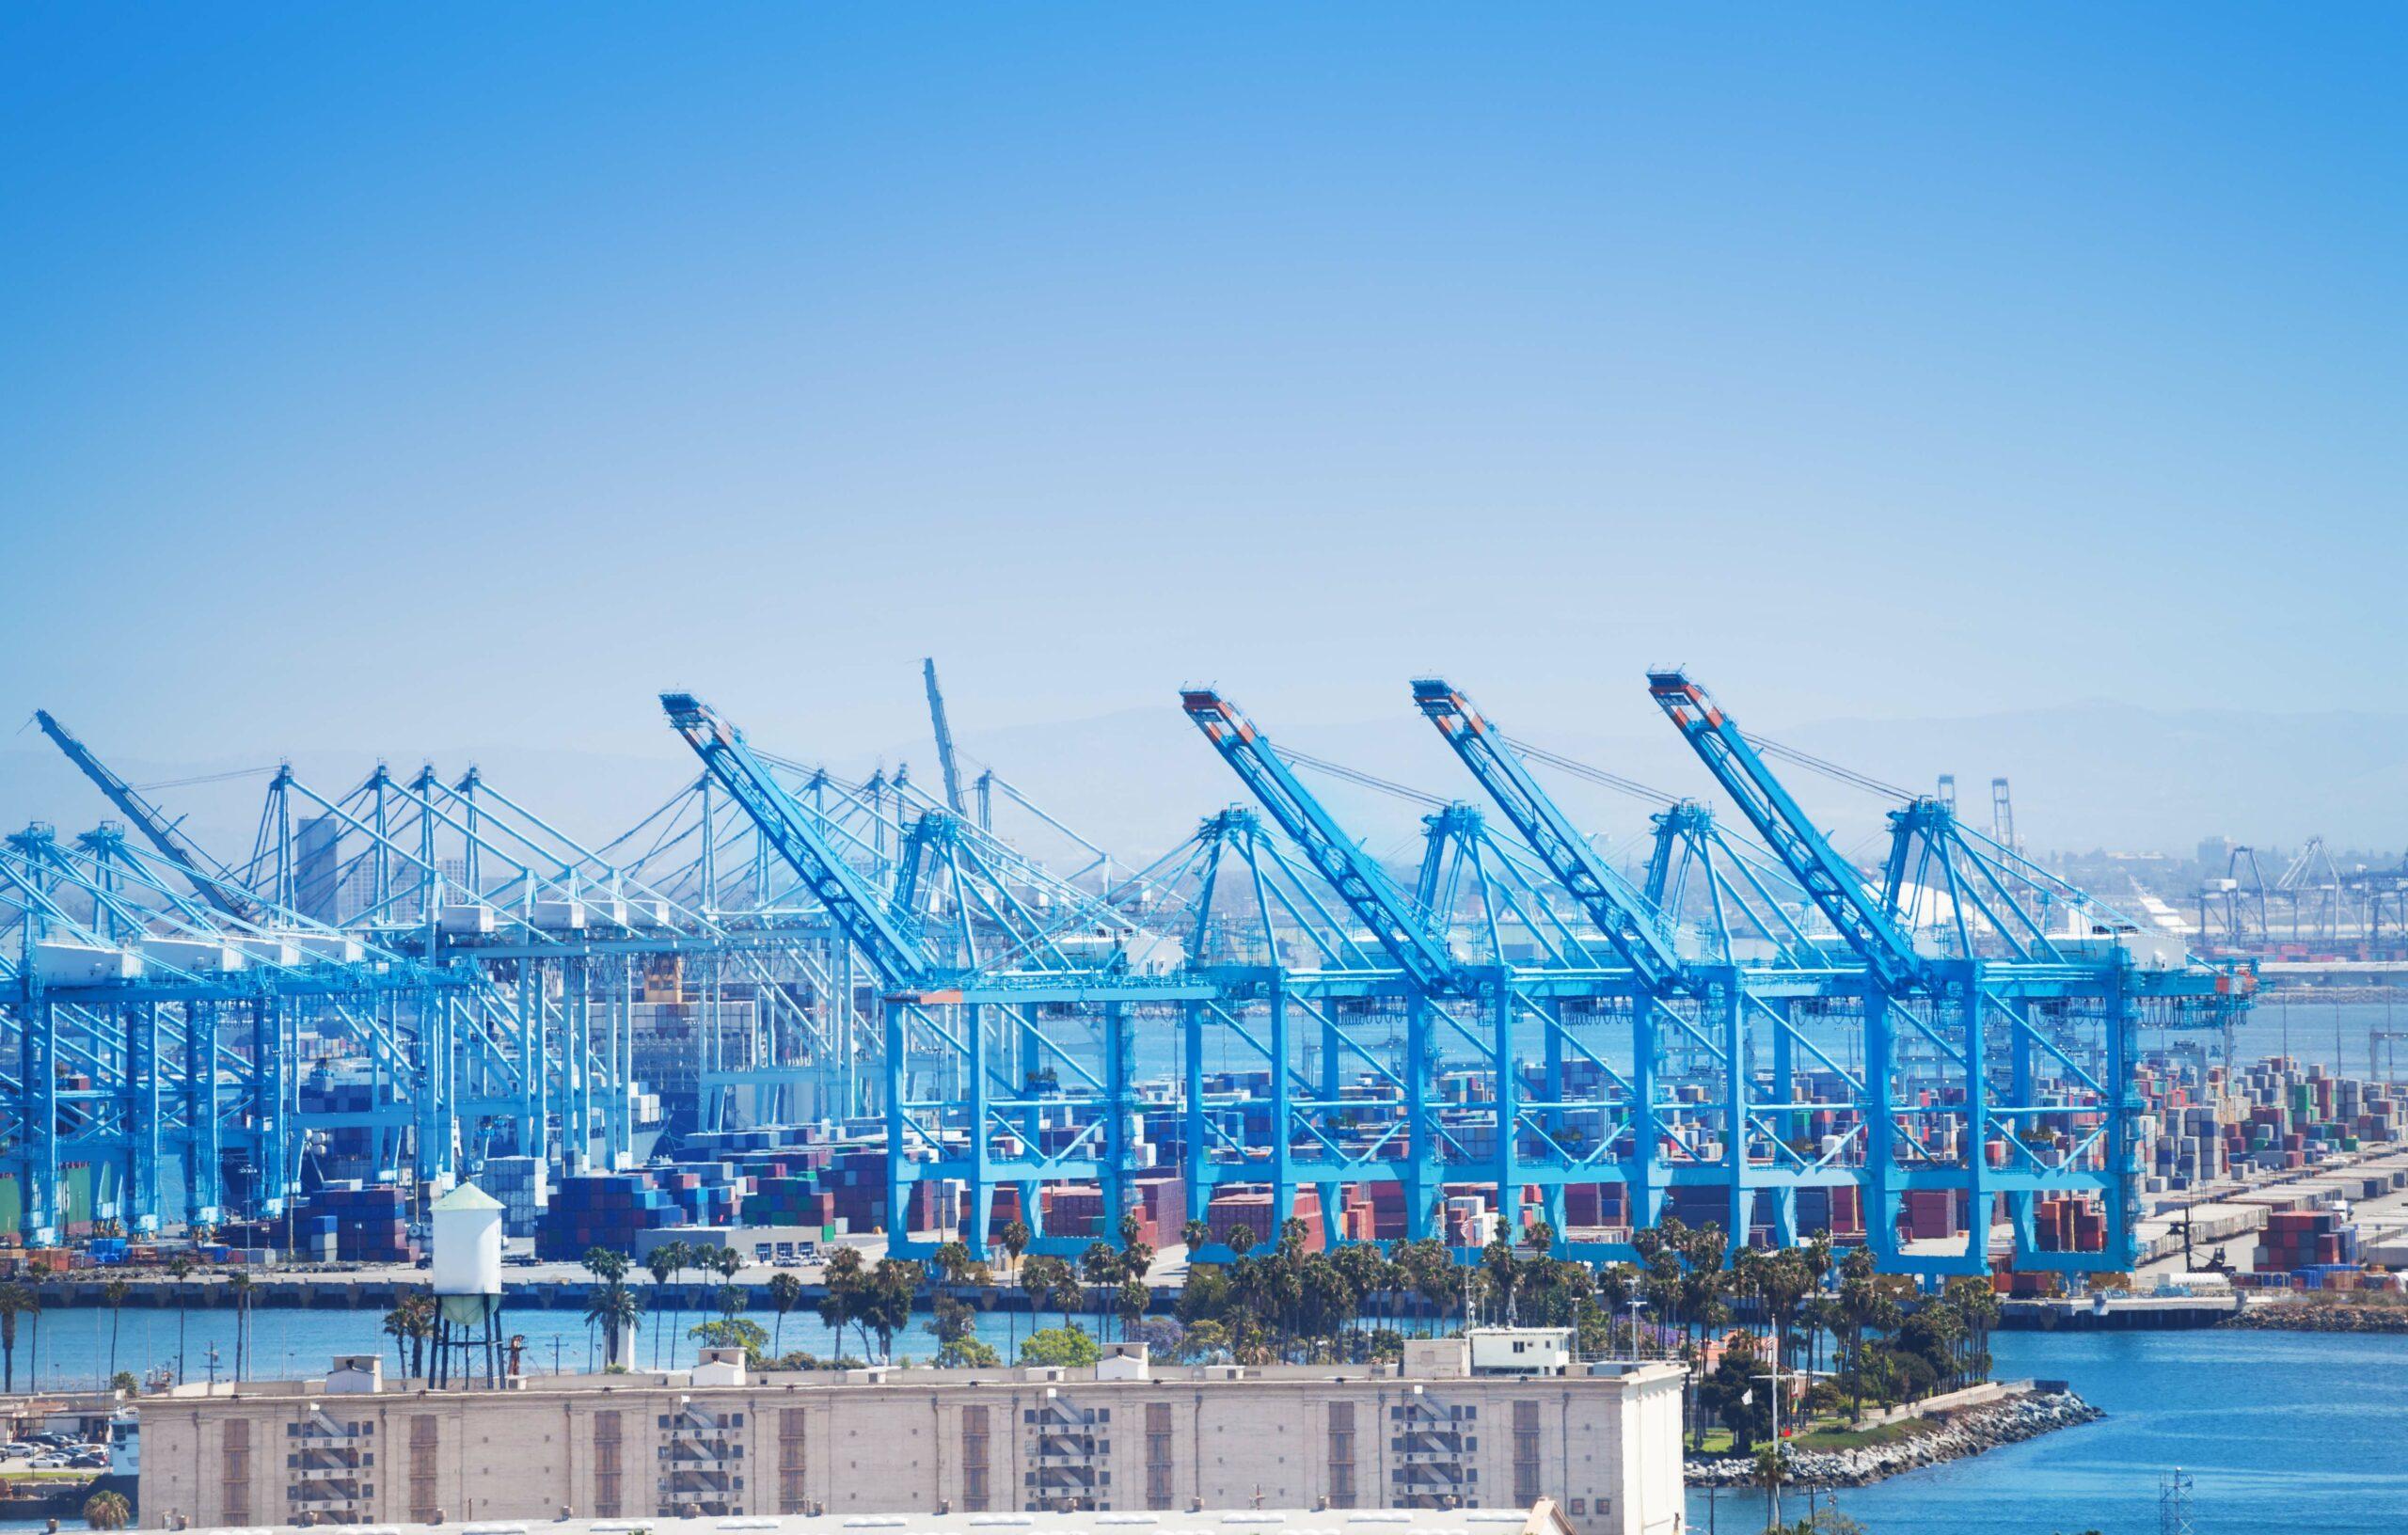 Long Beach port moves 8.1 million TEU during 2020 1